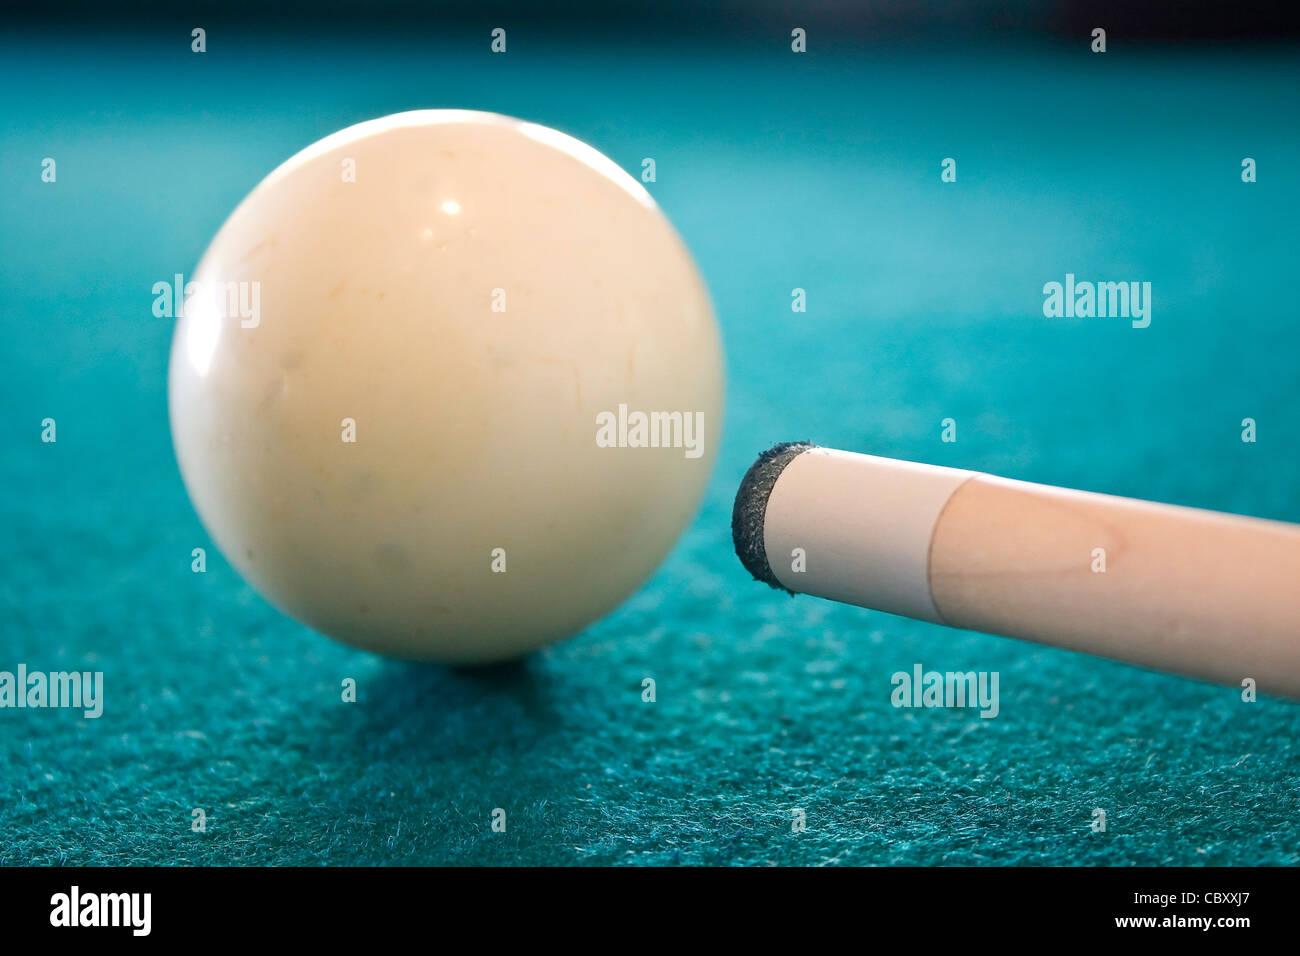 Billiard ball and cue stick macro - Stock Image